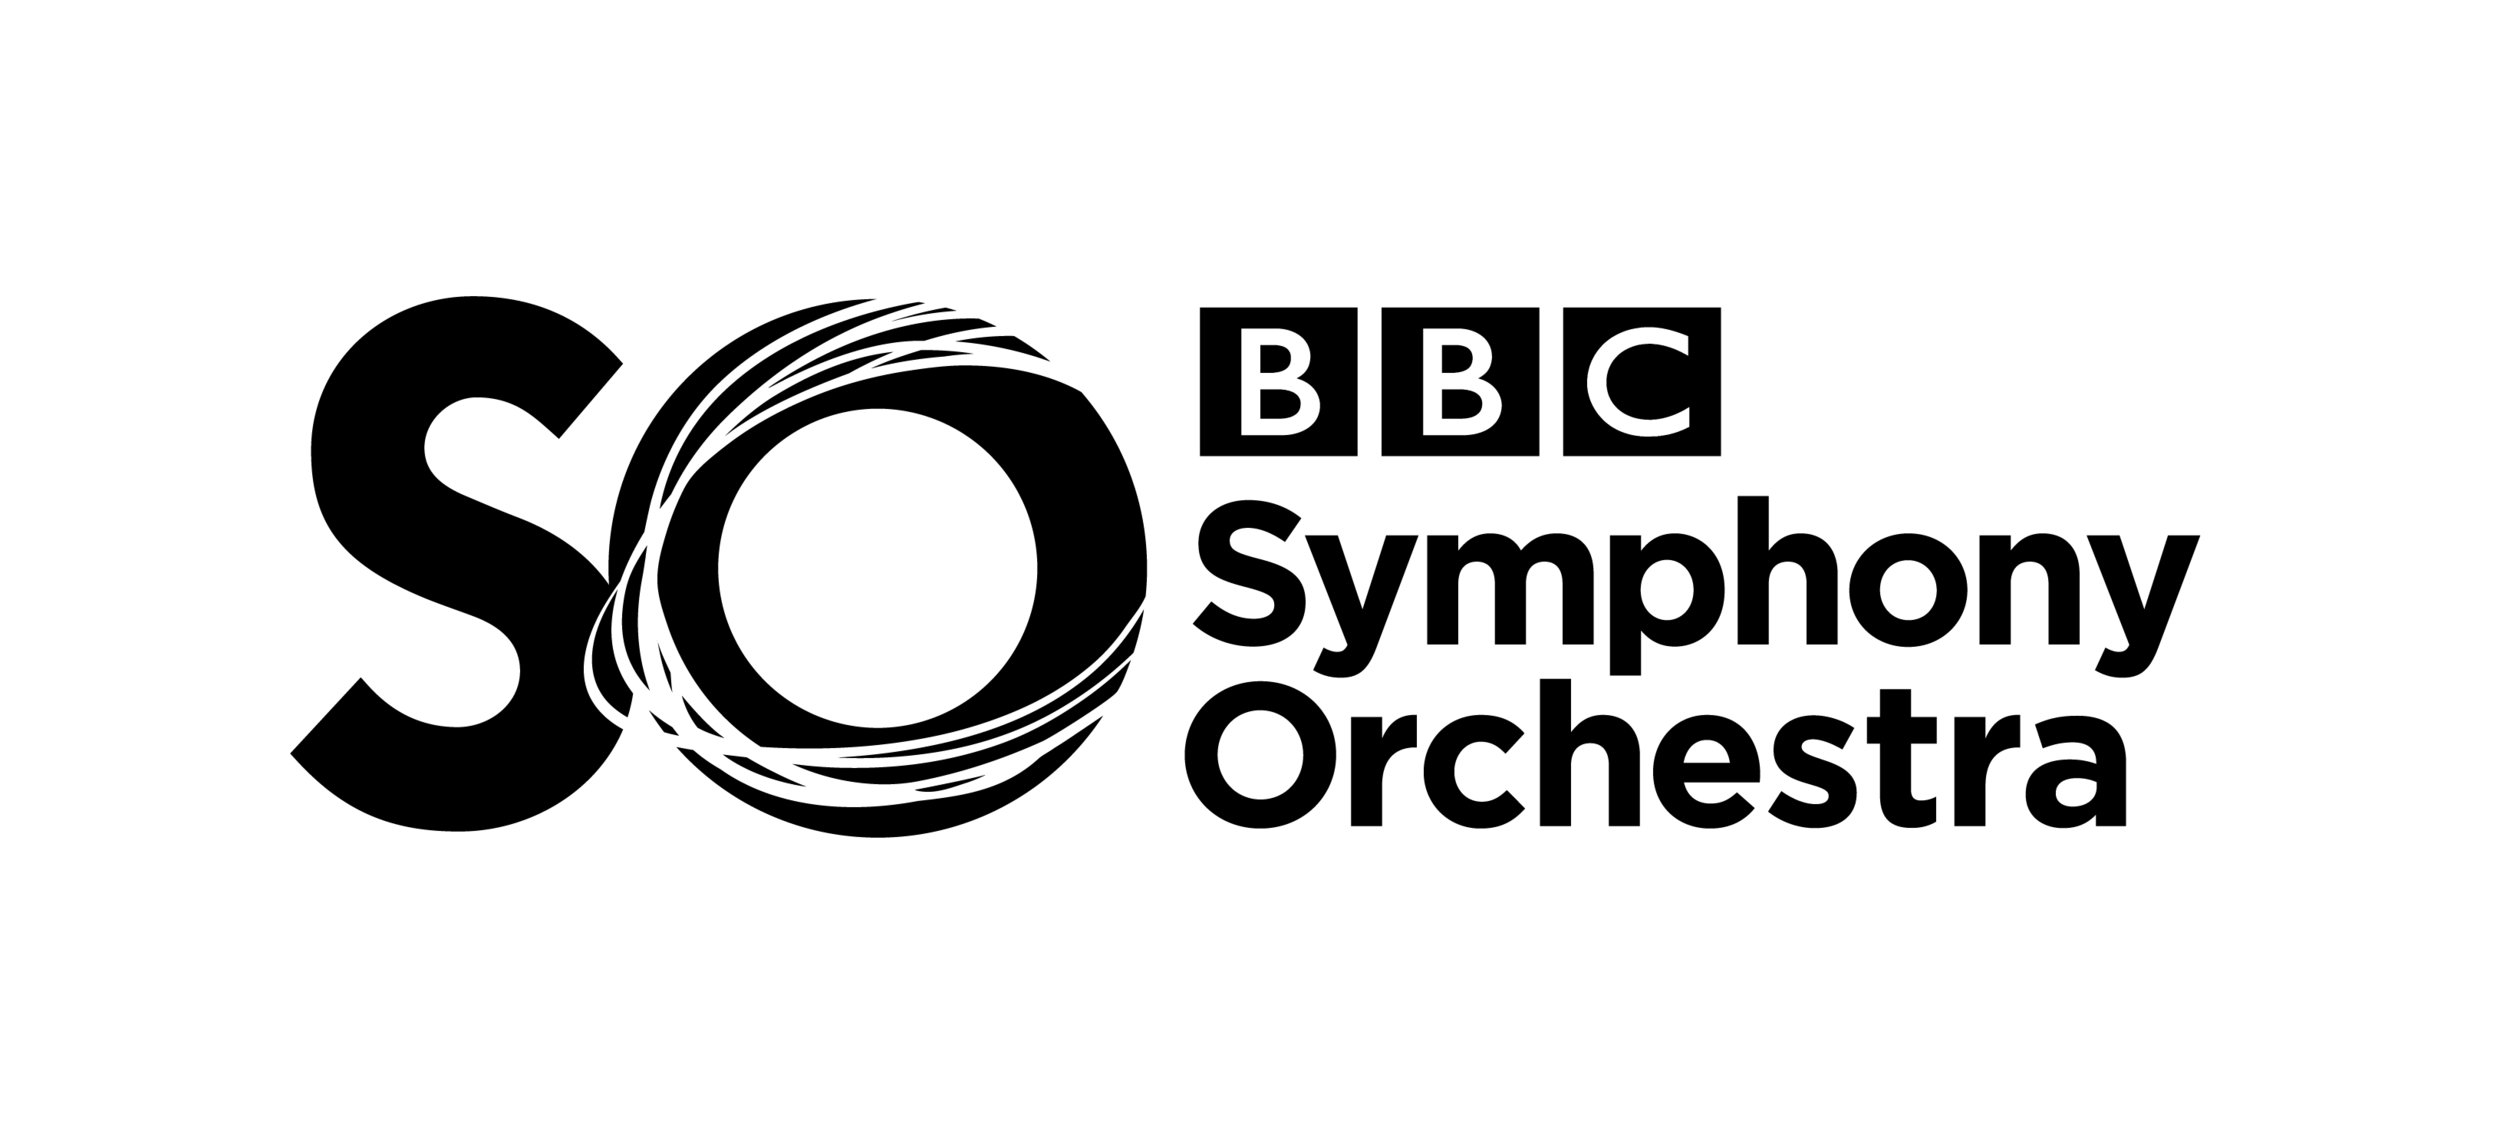 BBC Symphony Orchestra 1.jpg